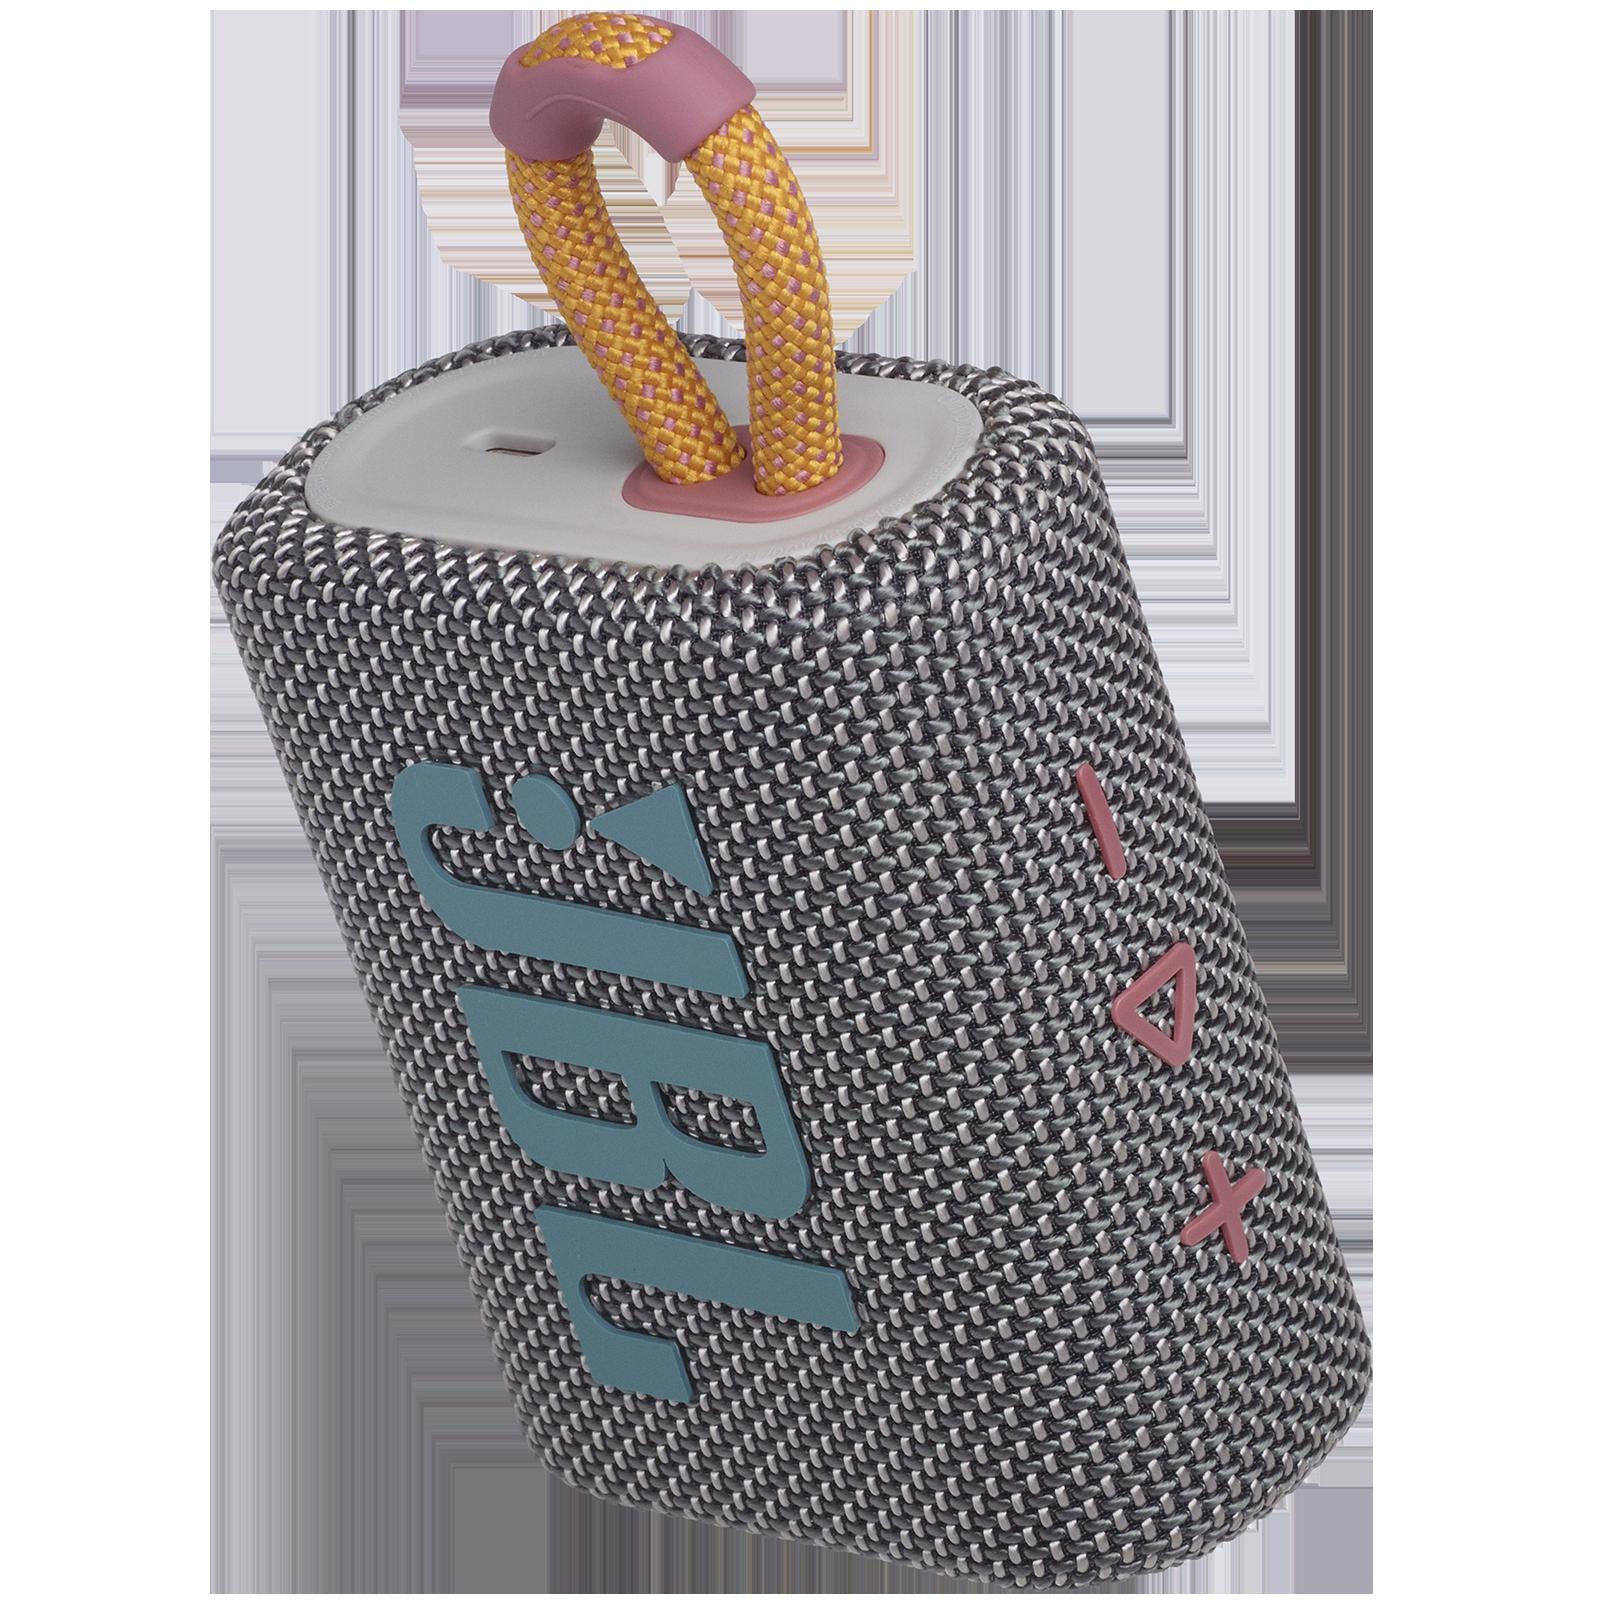 JBL GO 3 - Grey - Portable Waterproof Speaker - Detailshot 2